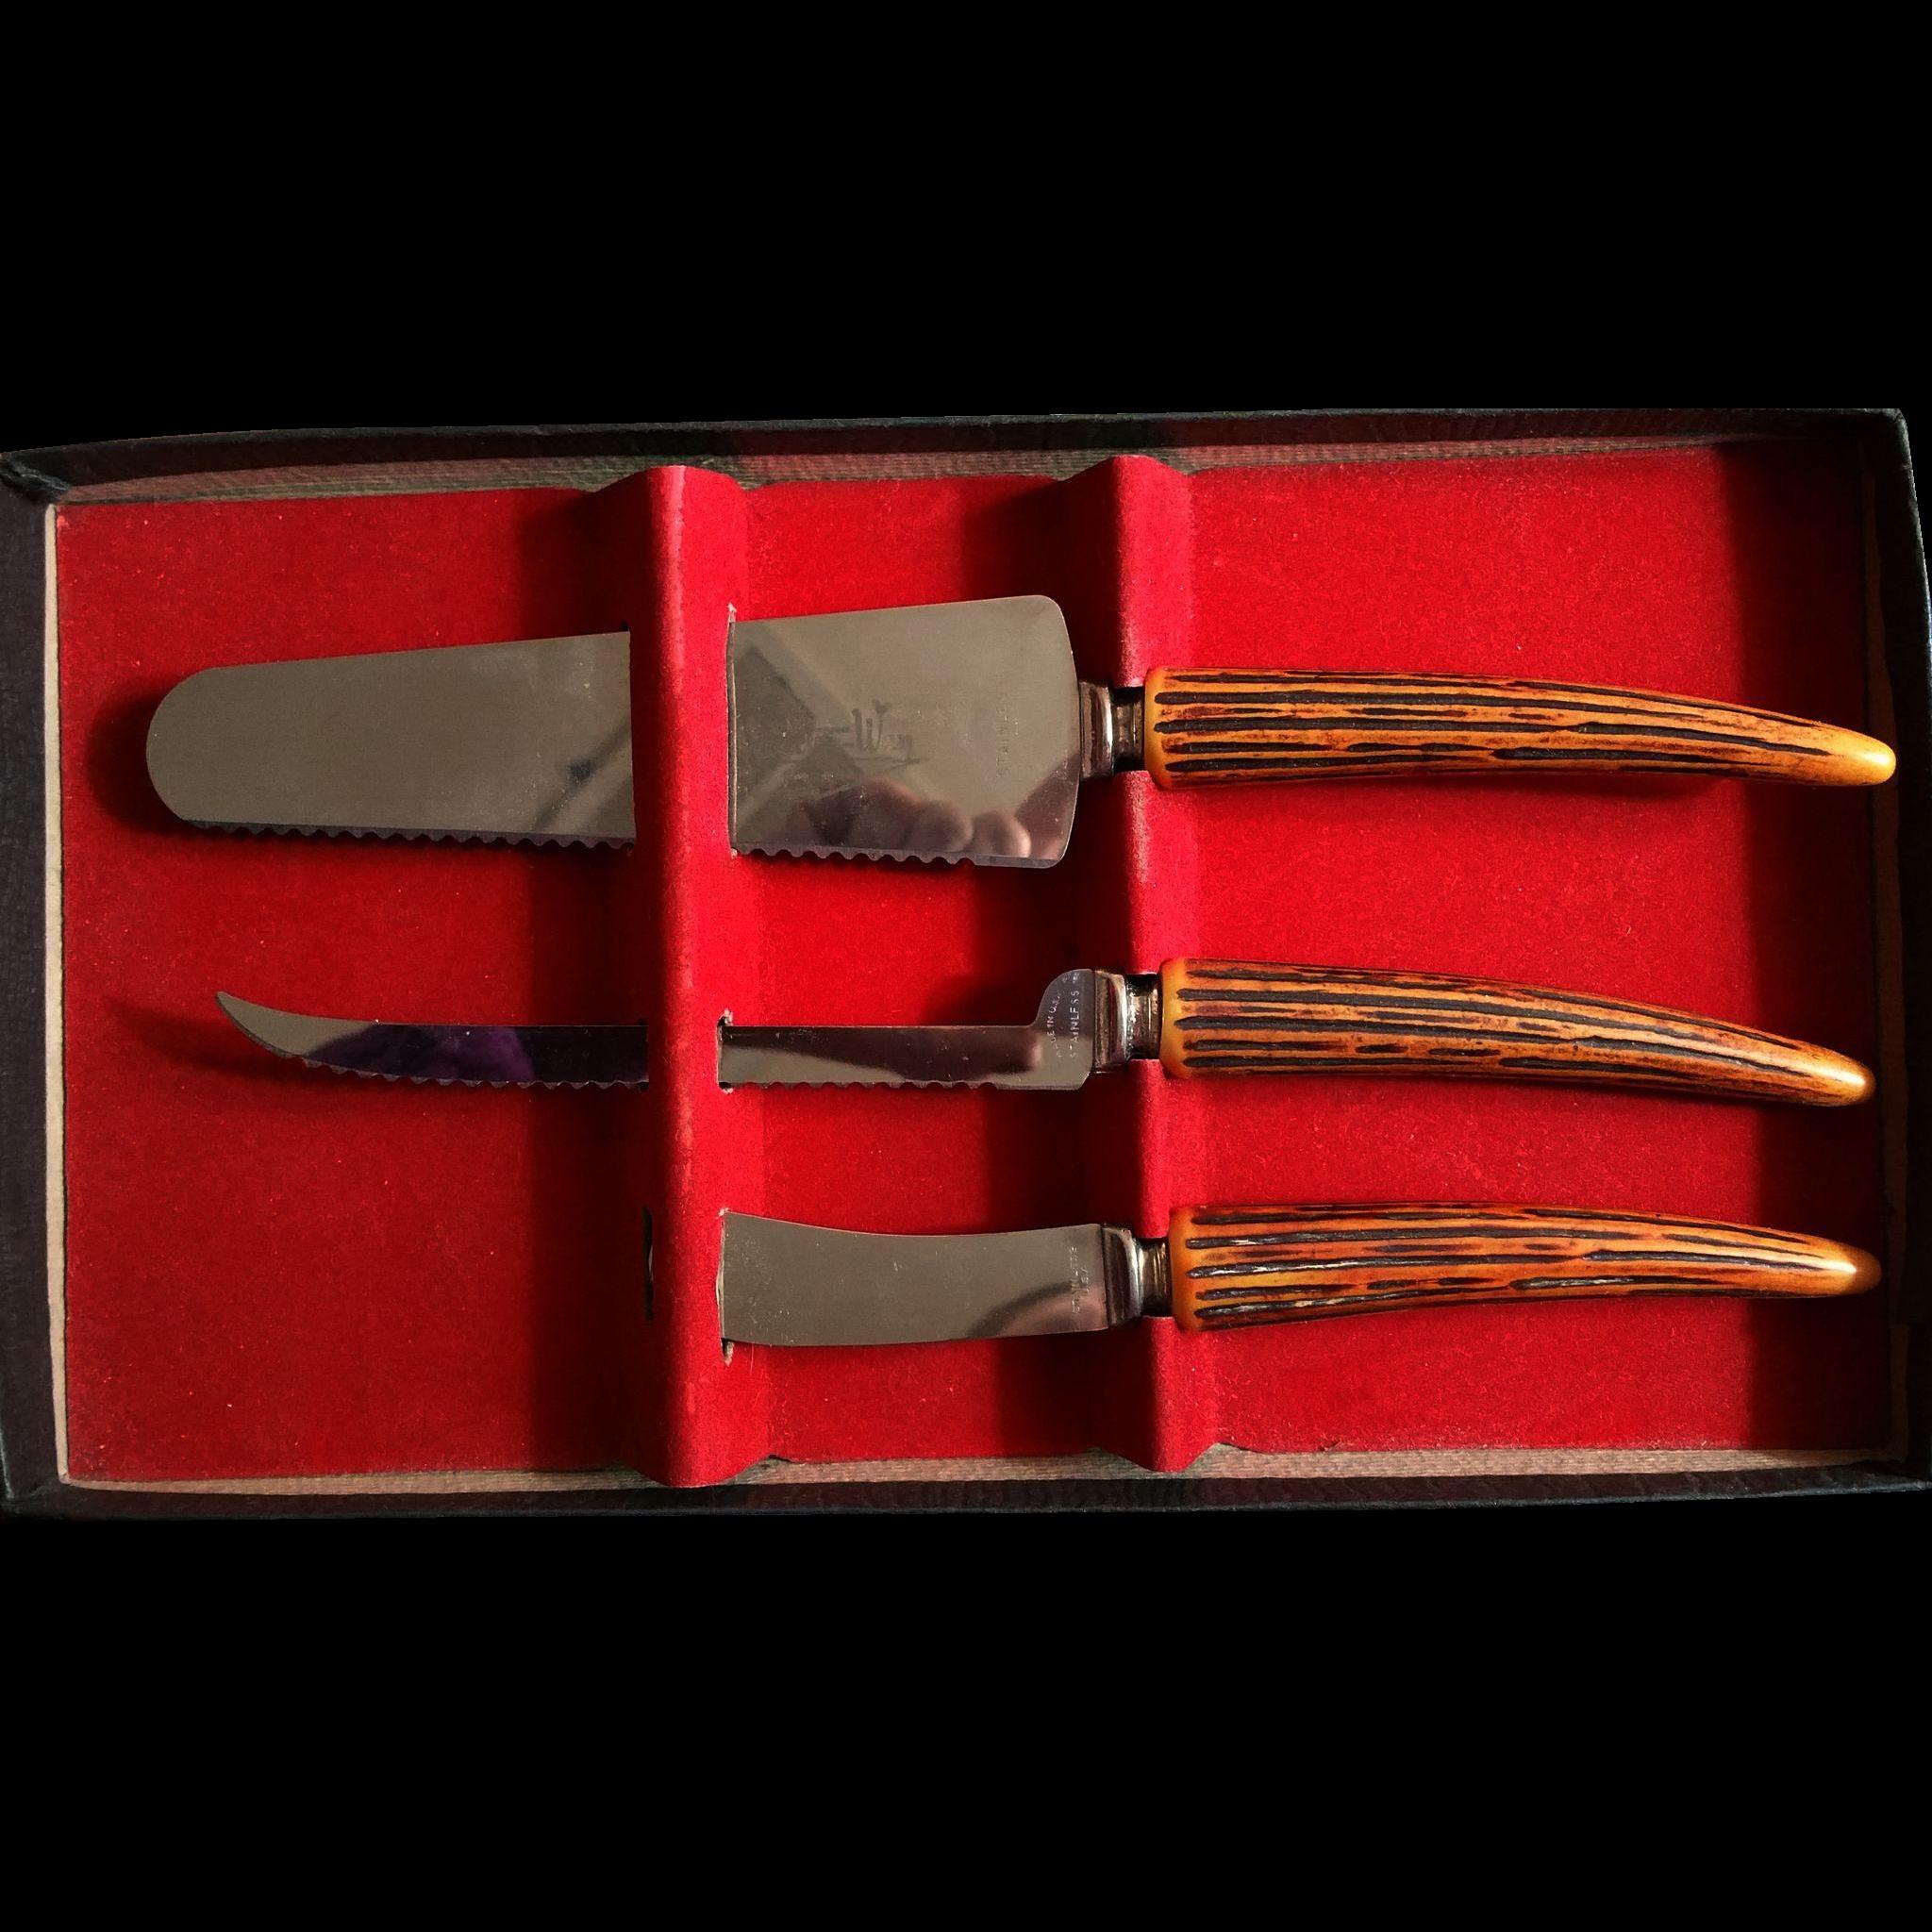 Electro-Way Bakelite Faux Stag Horn Handle 3 piece Cheese or Dessert Server Set Original Box No lid